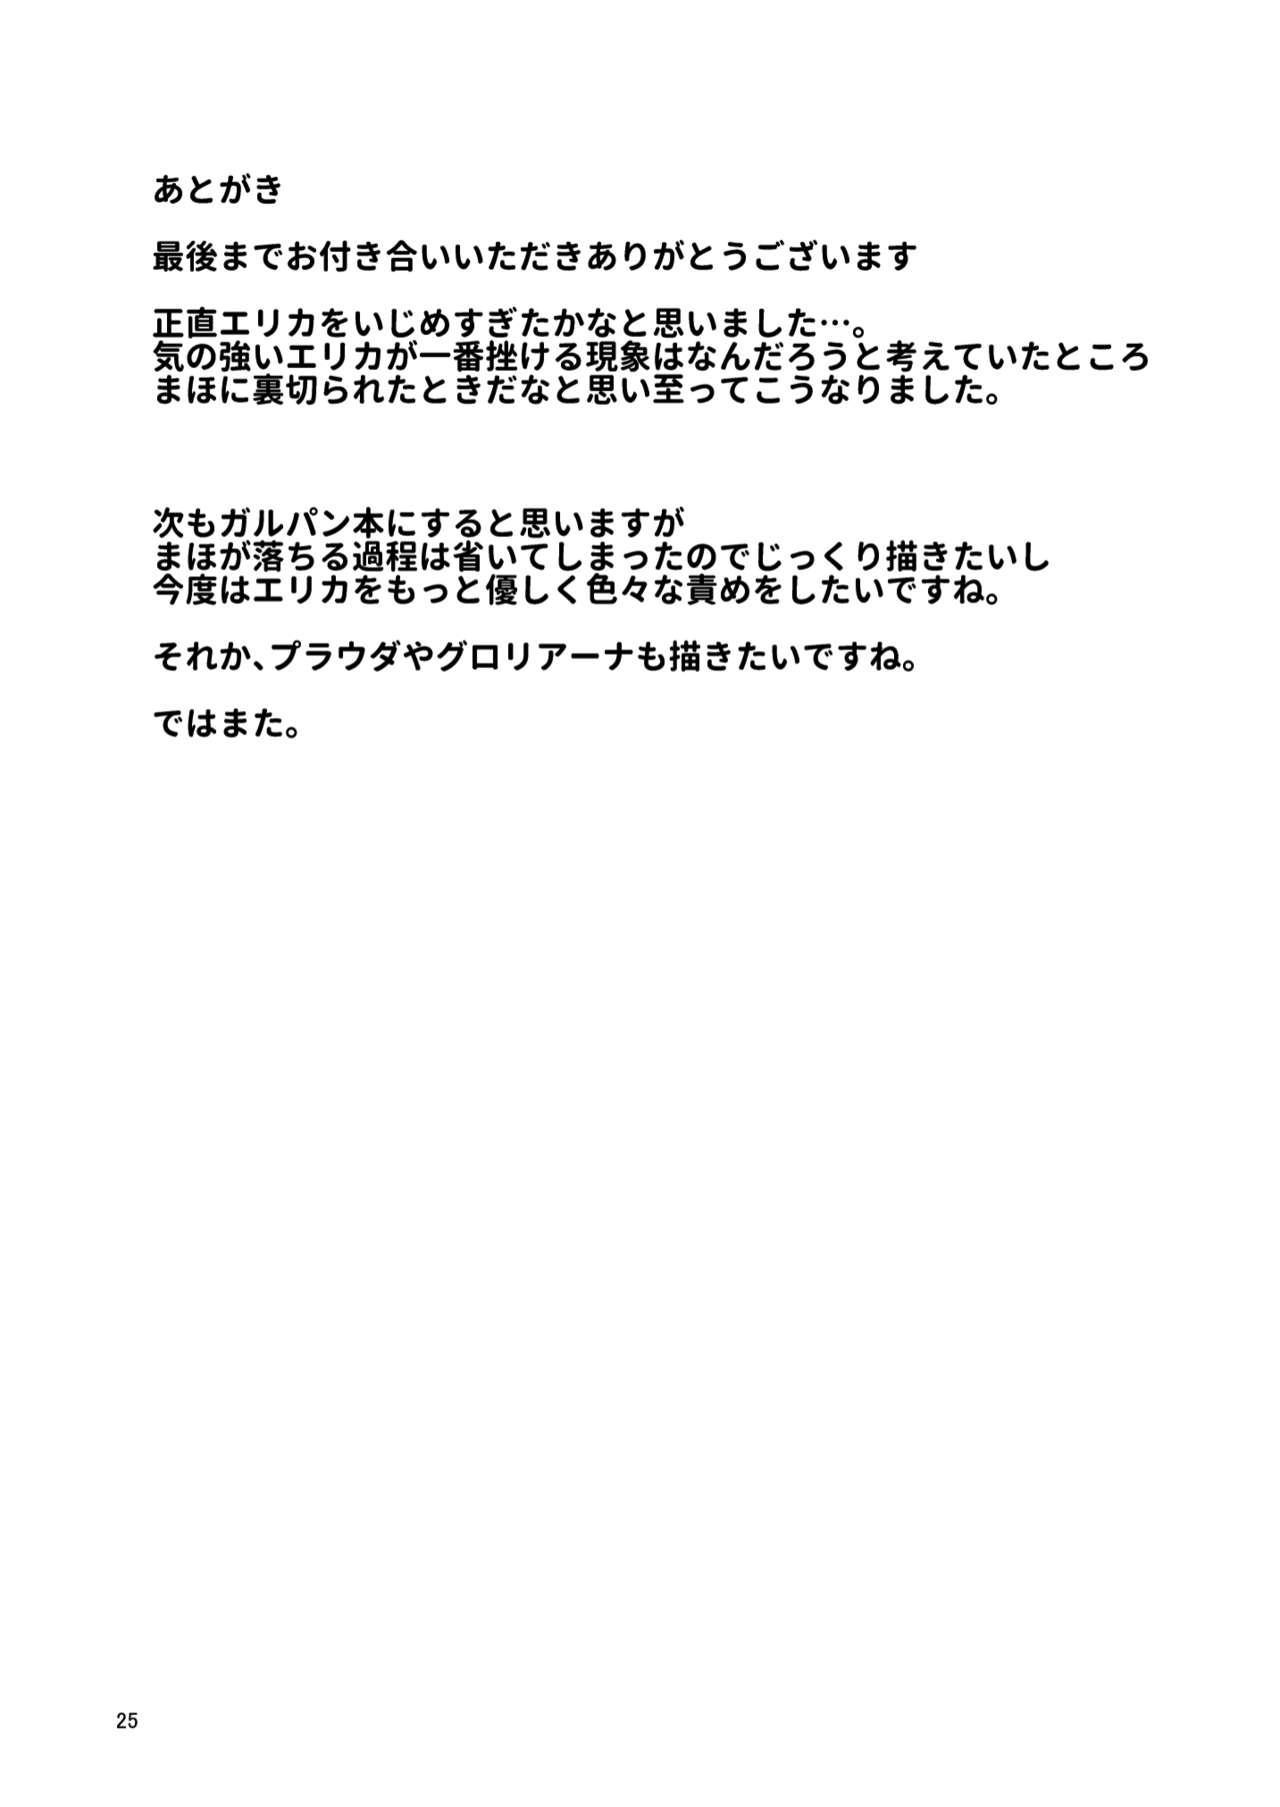 Kuromorimine Ryoujoku 23